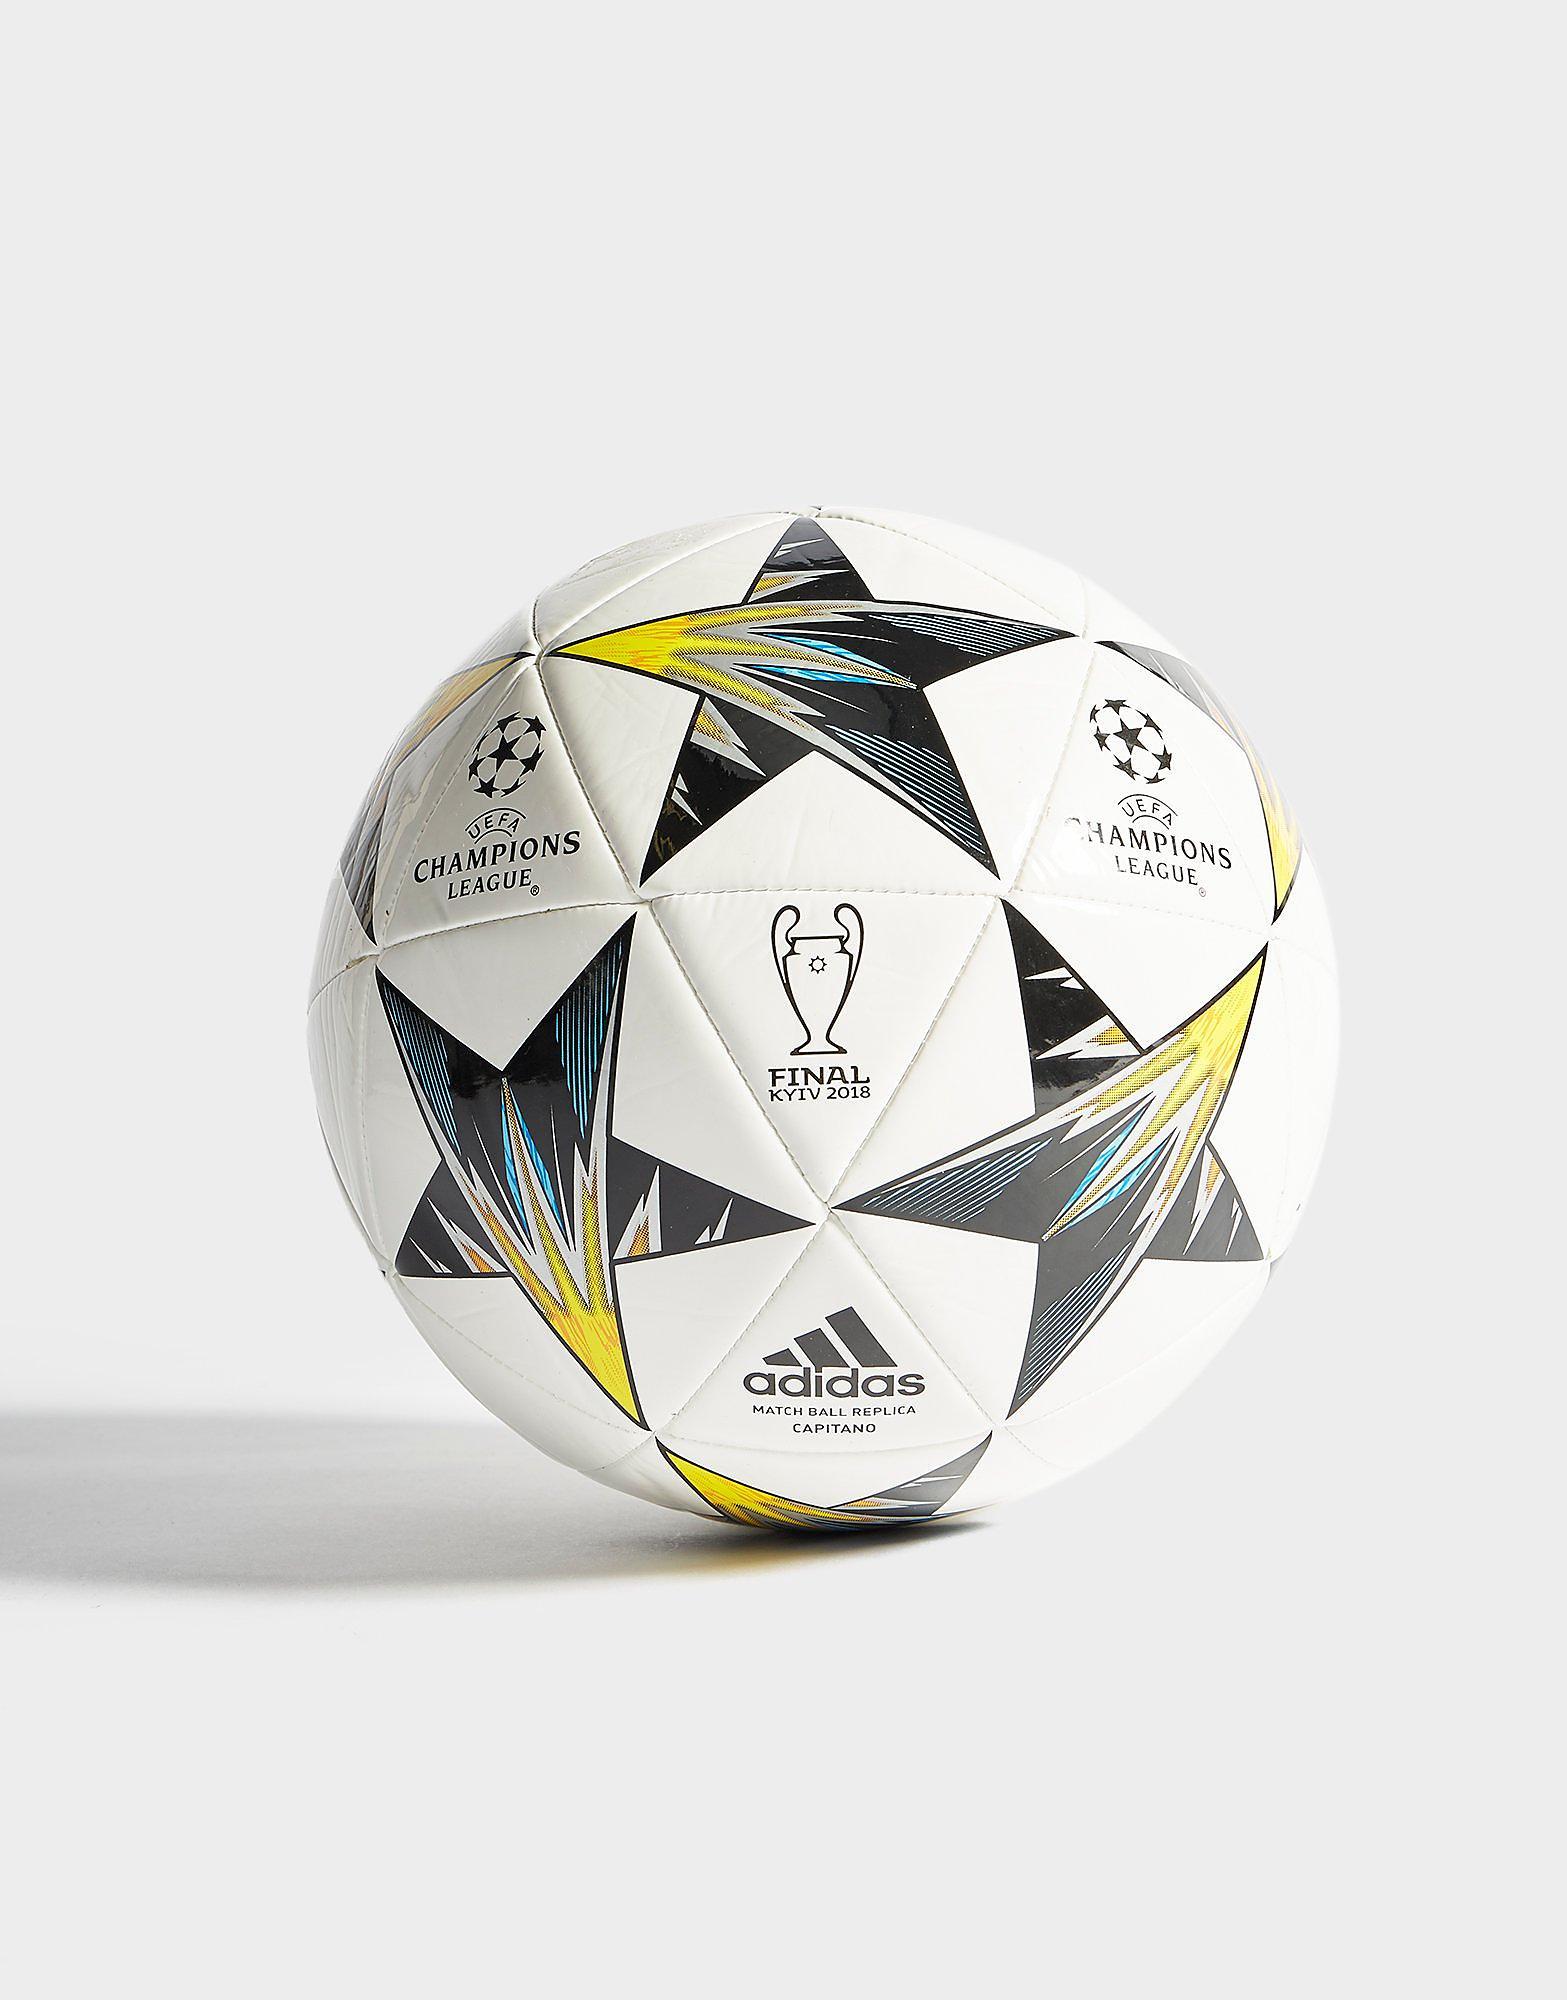 adidas Champion's League 2018 Final Football